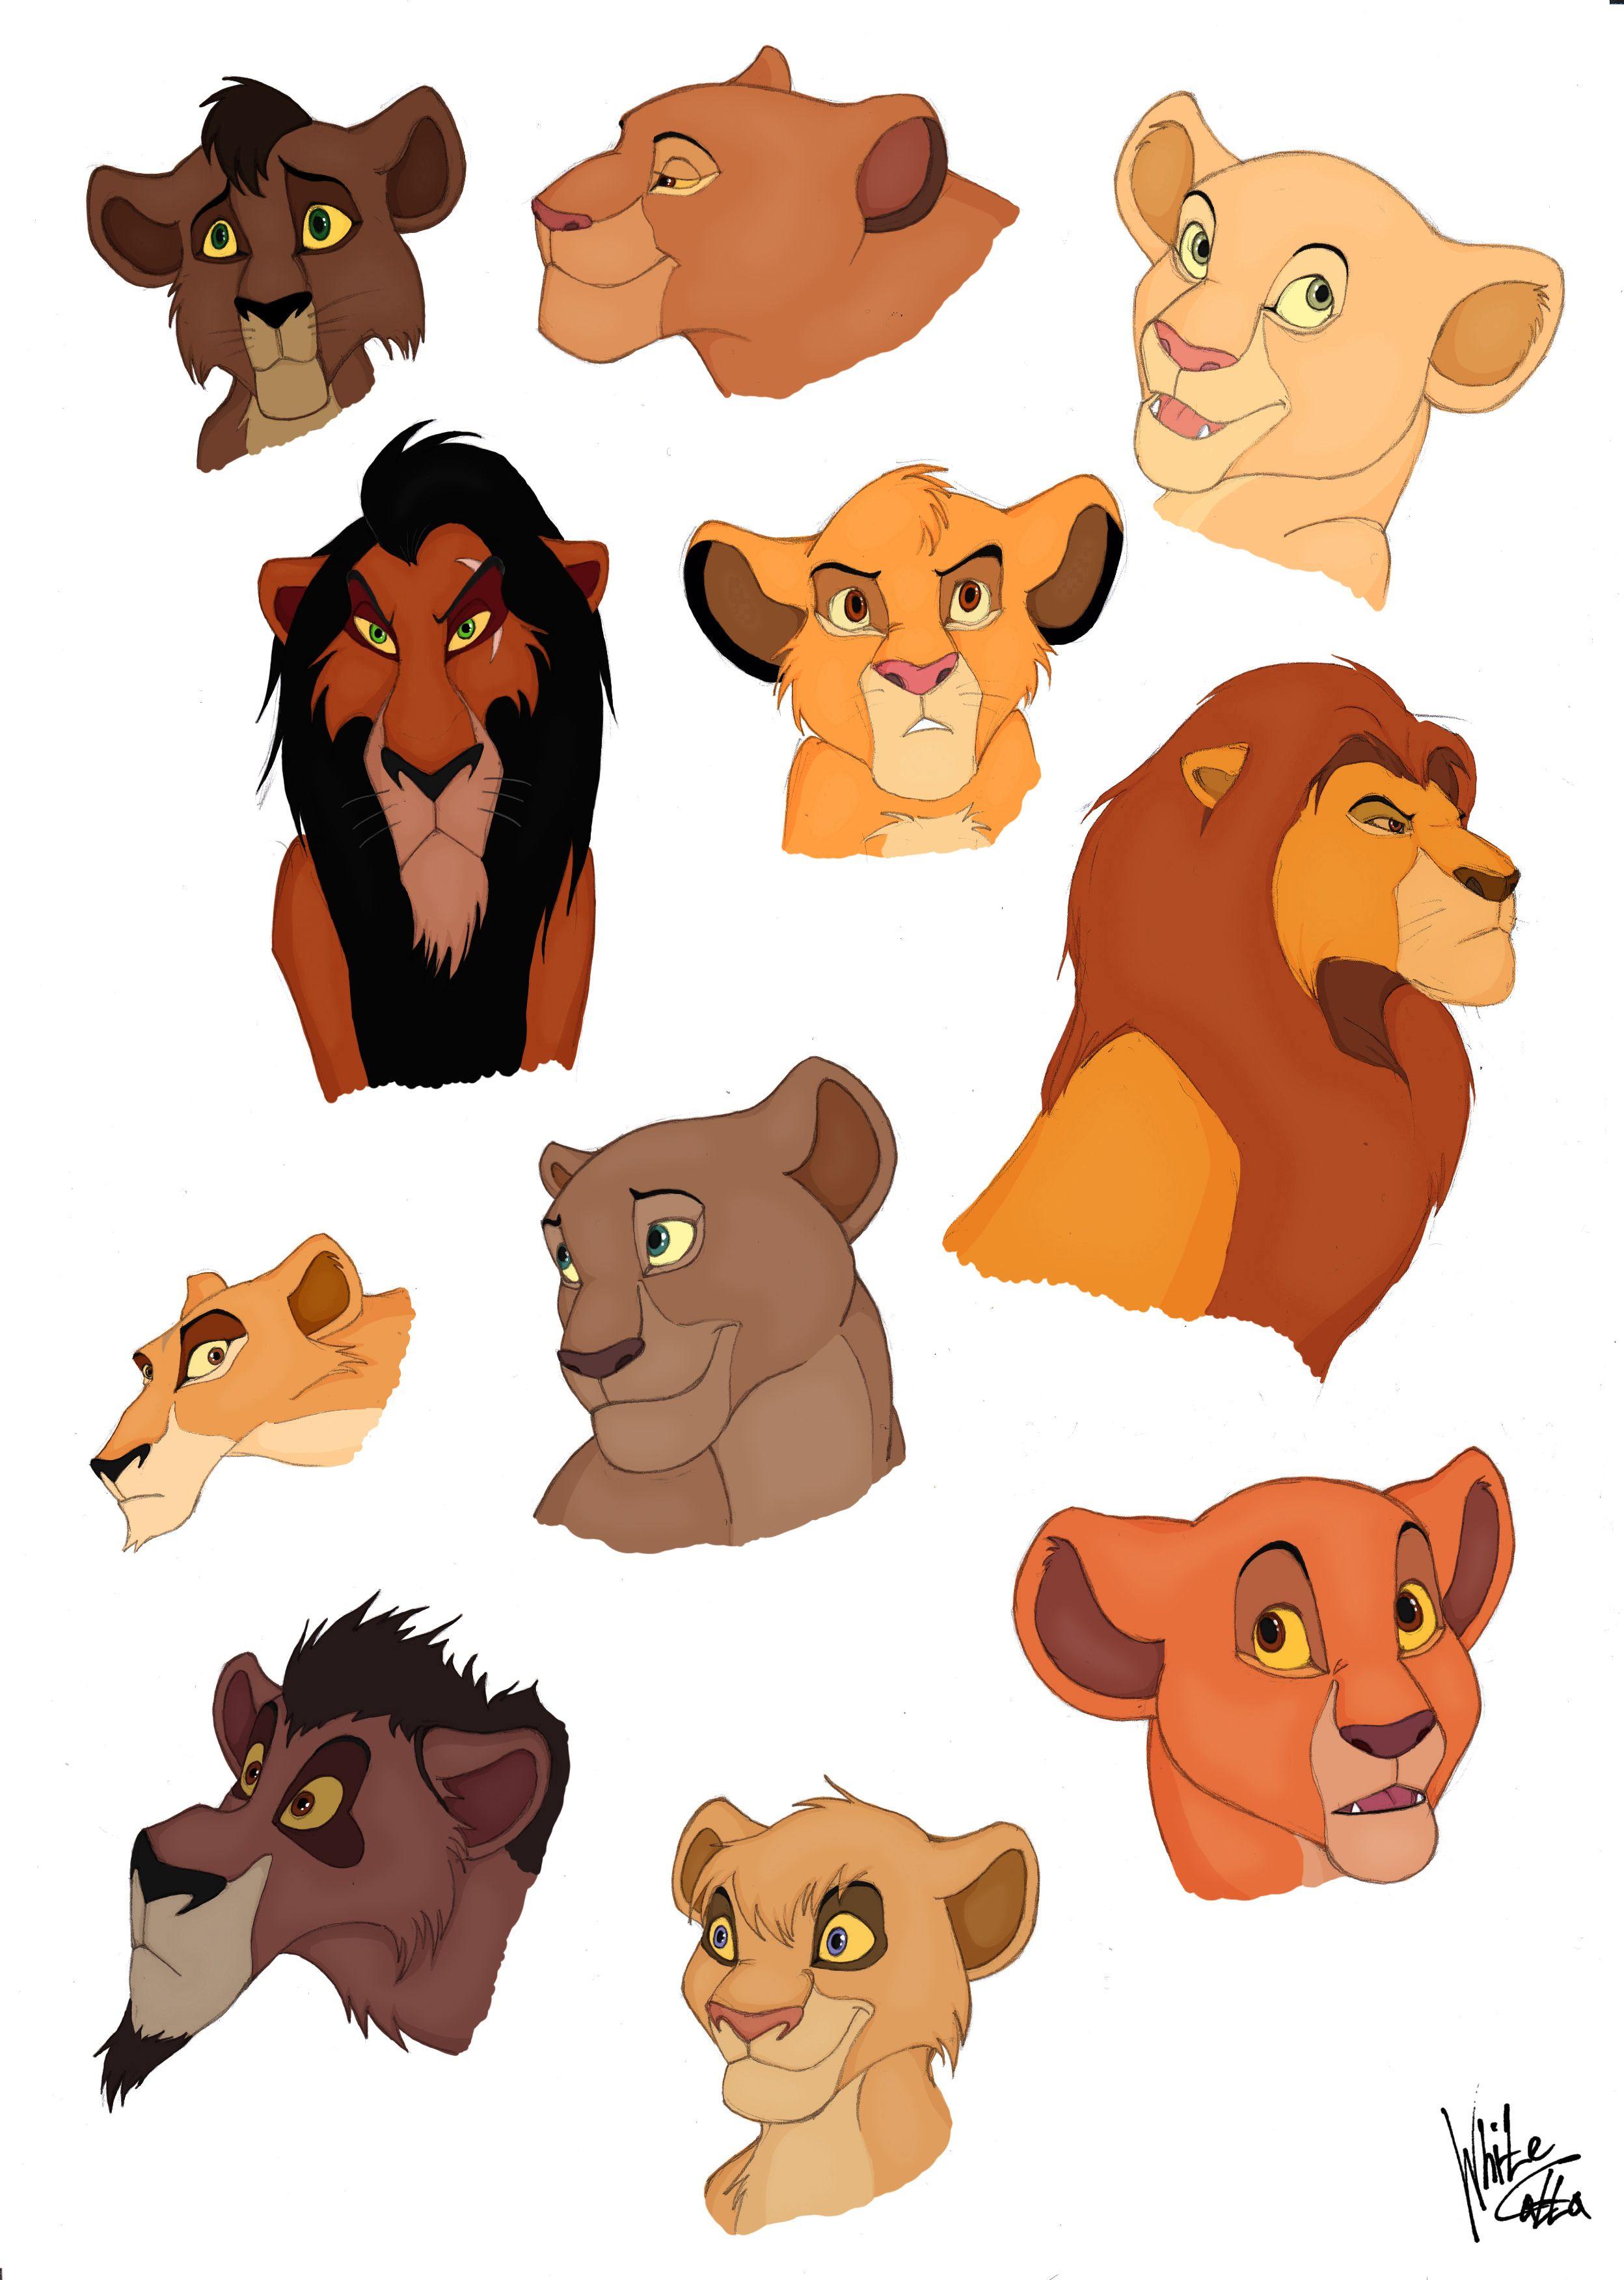 lion king characters full hd wallpaper